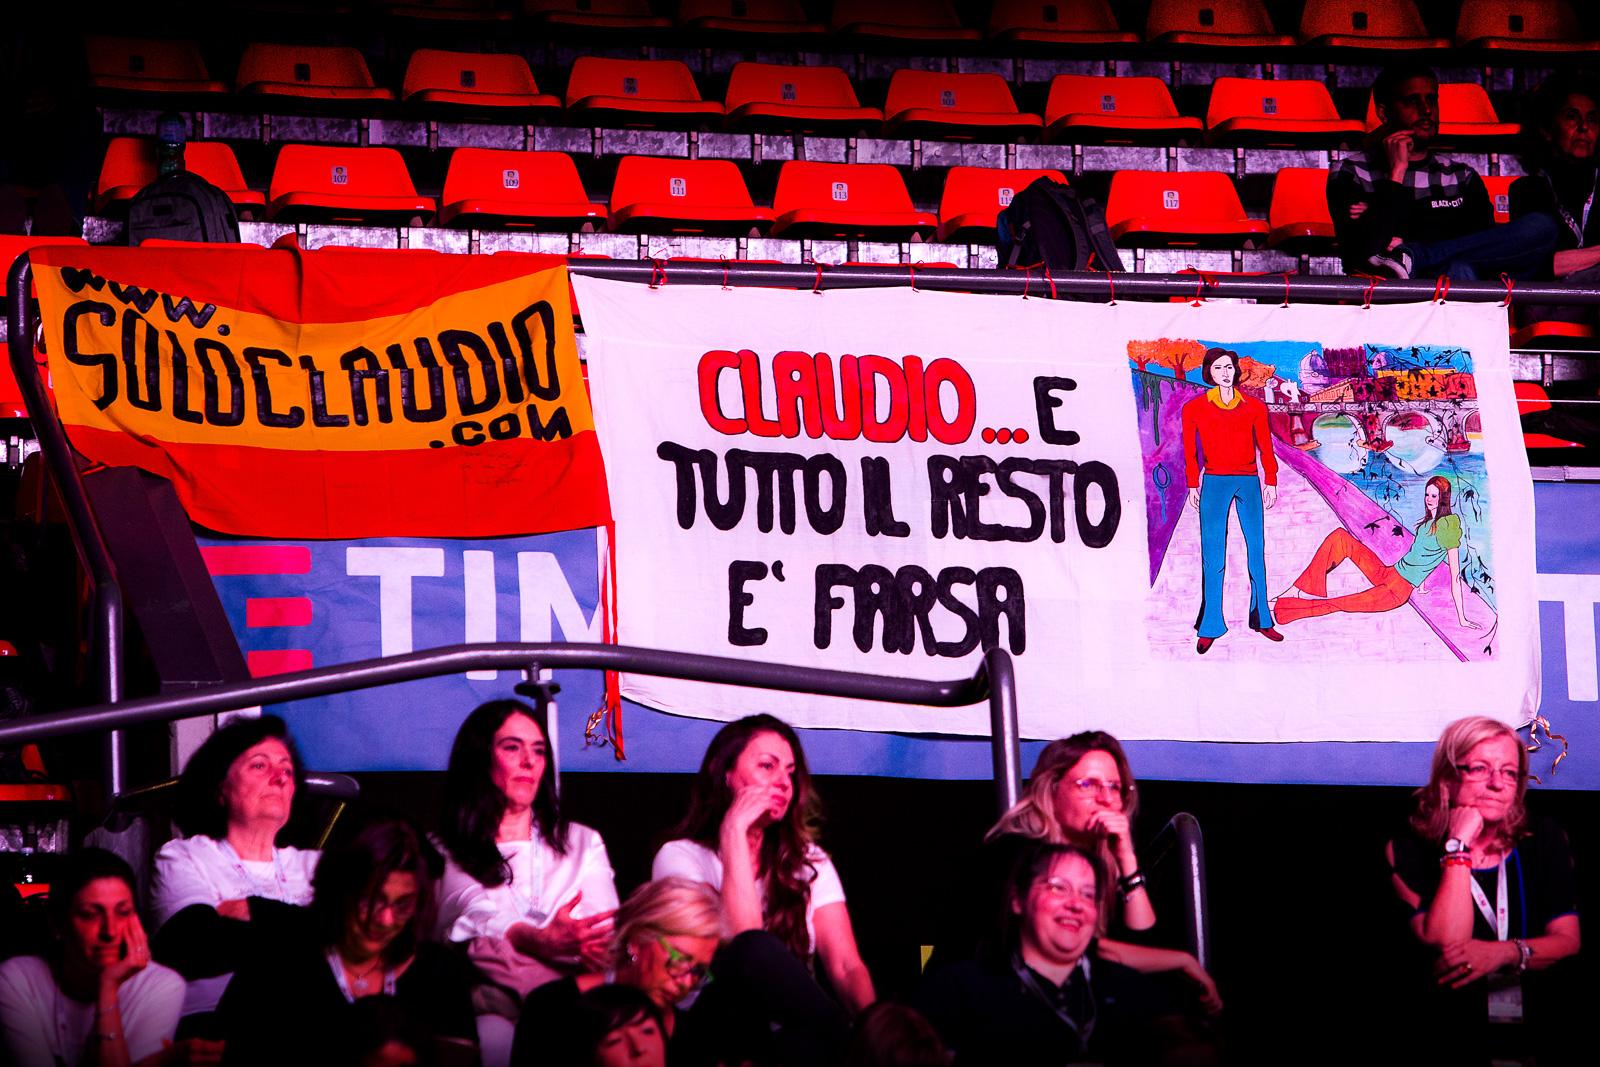 XXI Raduno Clab - Firenze - 25 aprile